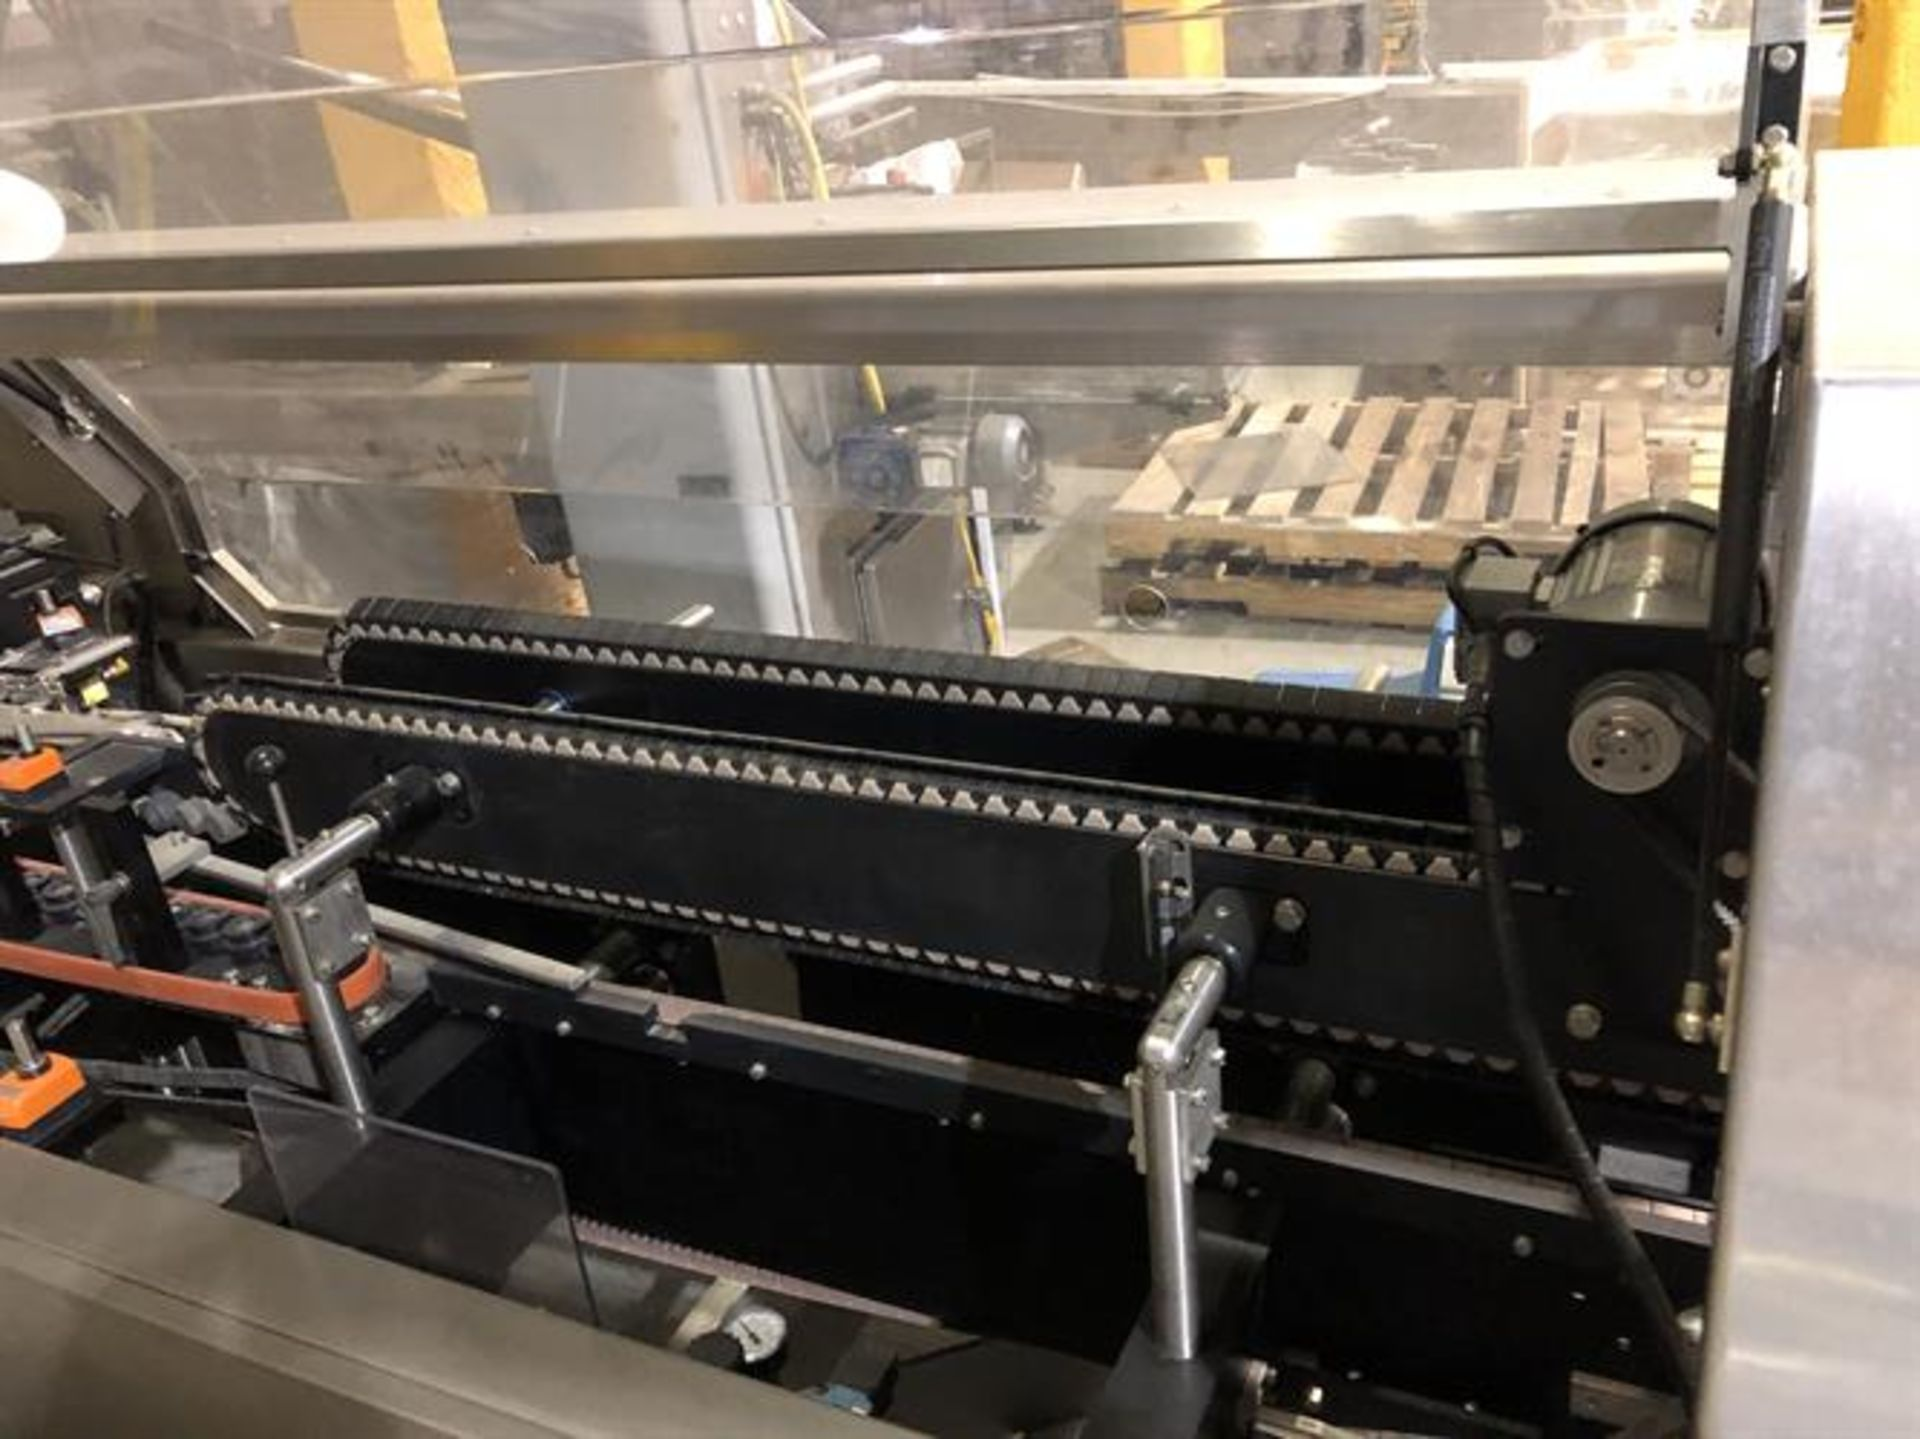 Bradman Lake inline Top Flap Sealer carton closer - Nordson Hot Melt - Allen Bradley Panelview - Image 2 of 19